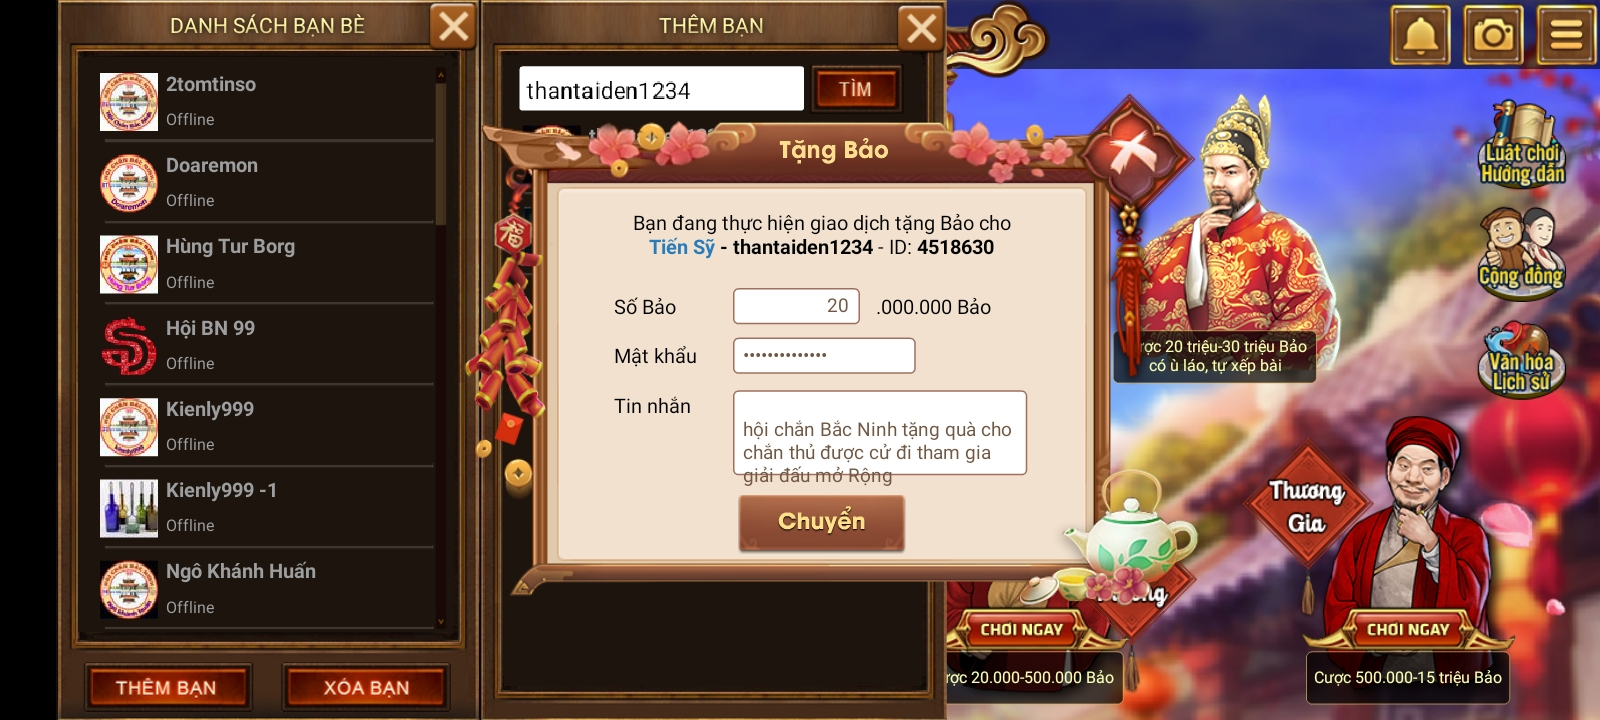 Screenshot_2021-05-19-08-01-03-10.